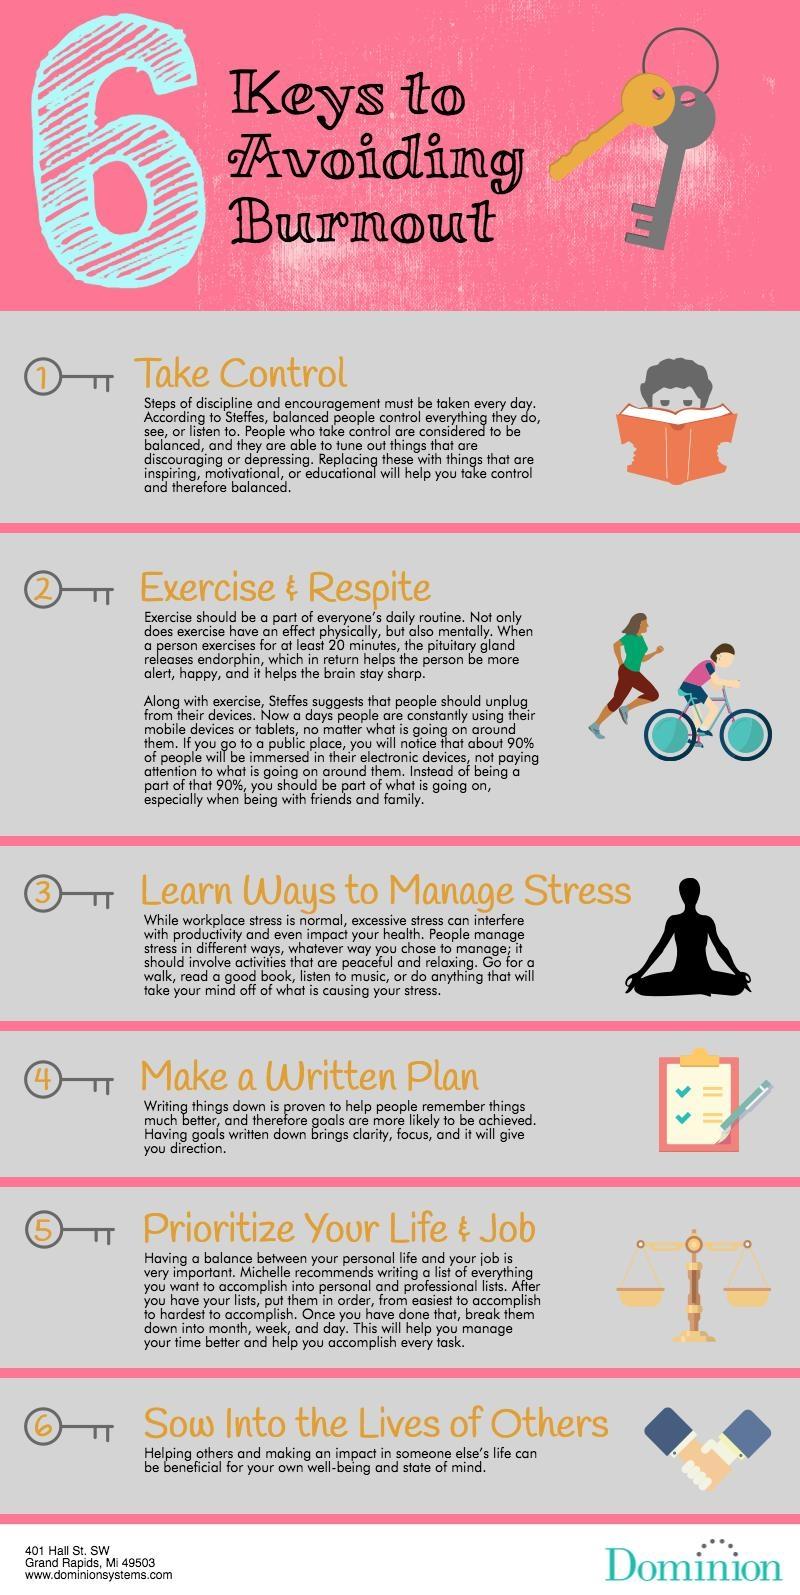 6-keys-avoiding-burnout-stress-workplace-exercise-control